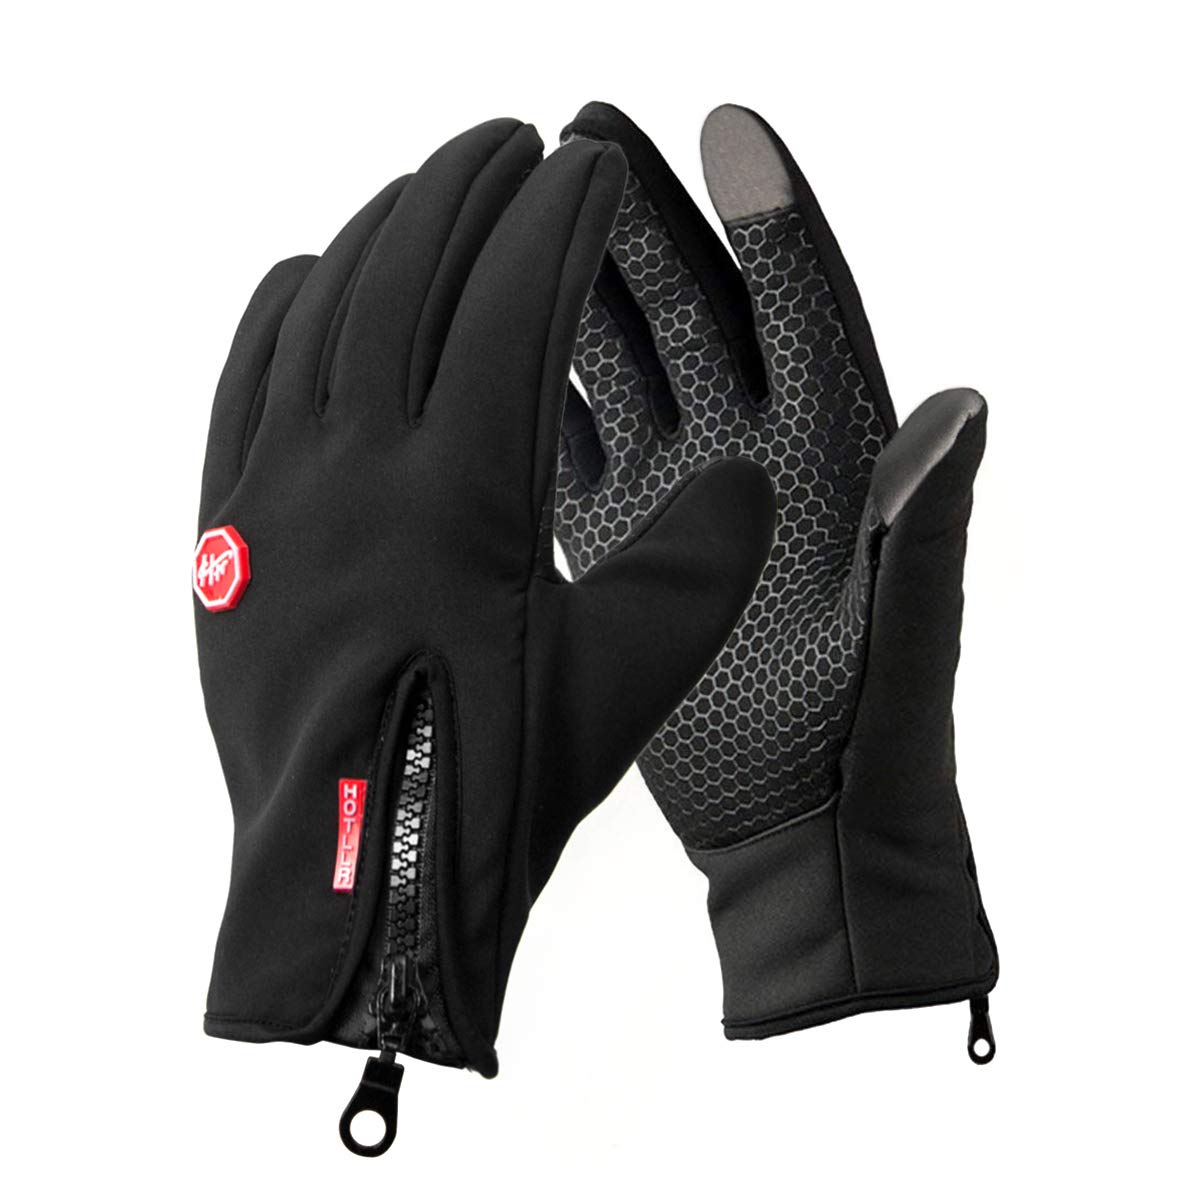 New Weatherproof Neoprene Winter Cycling Bicycle Full Finger Glove for Men